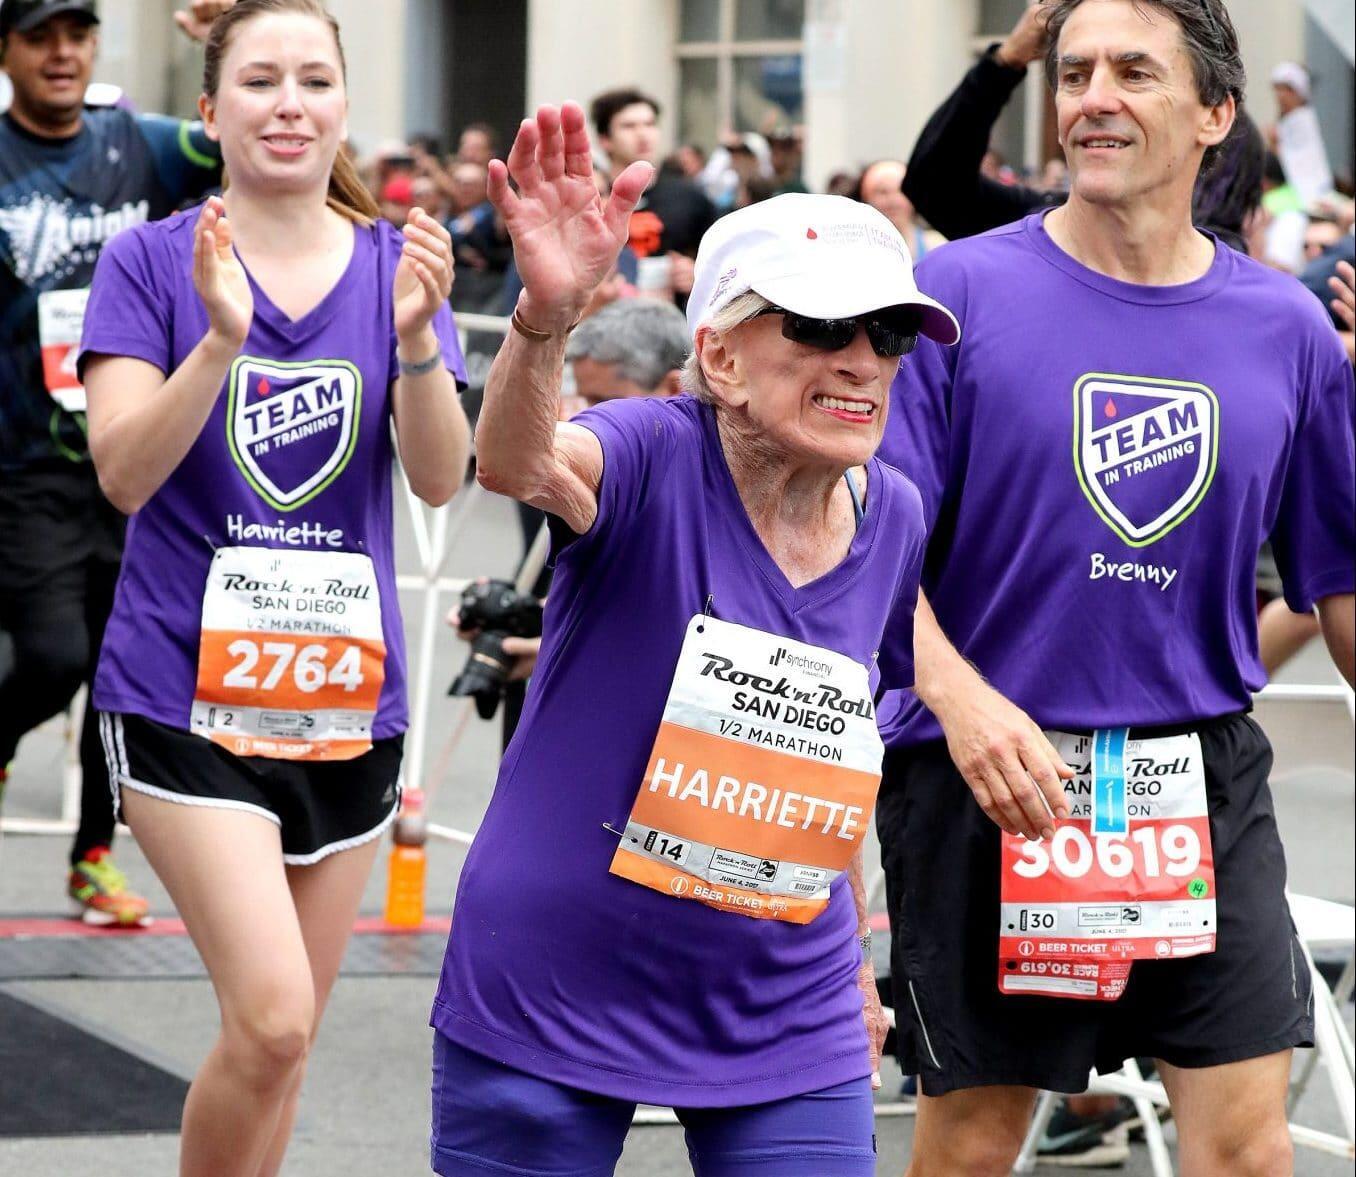 Cụ bà Harriette Thompson lập kỷ lục thế giới khi chinh phục Half-Marathon ở tuổi 94